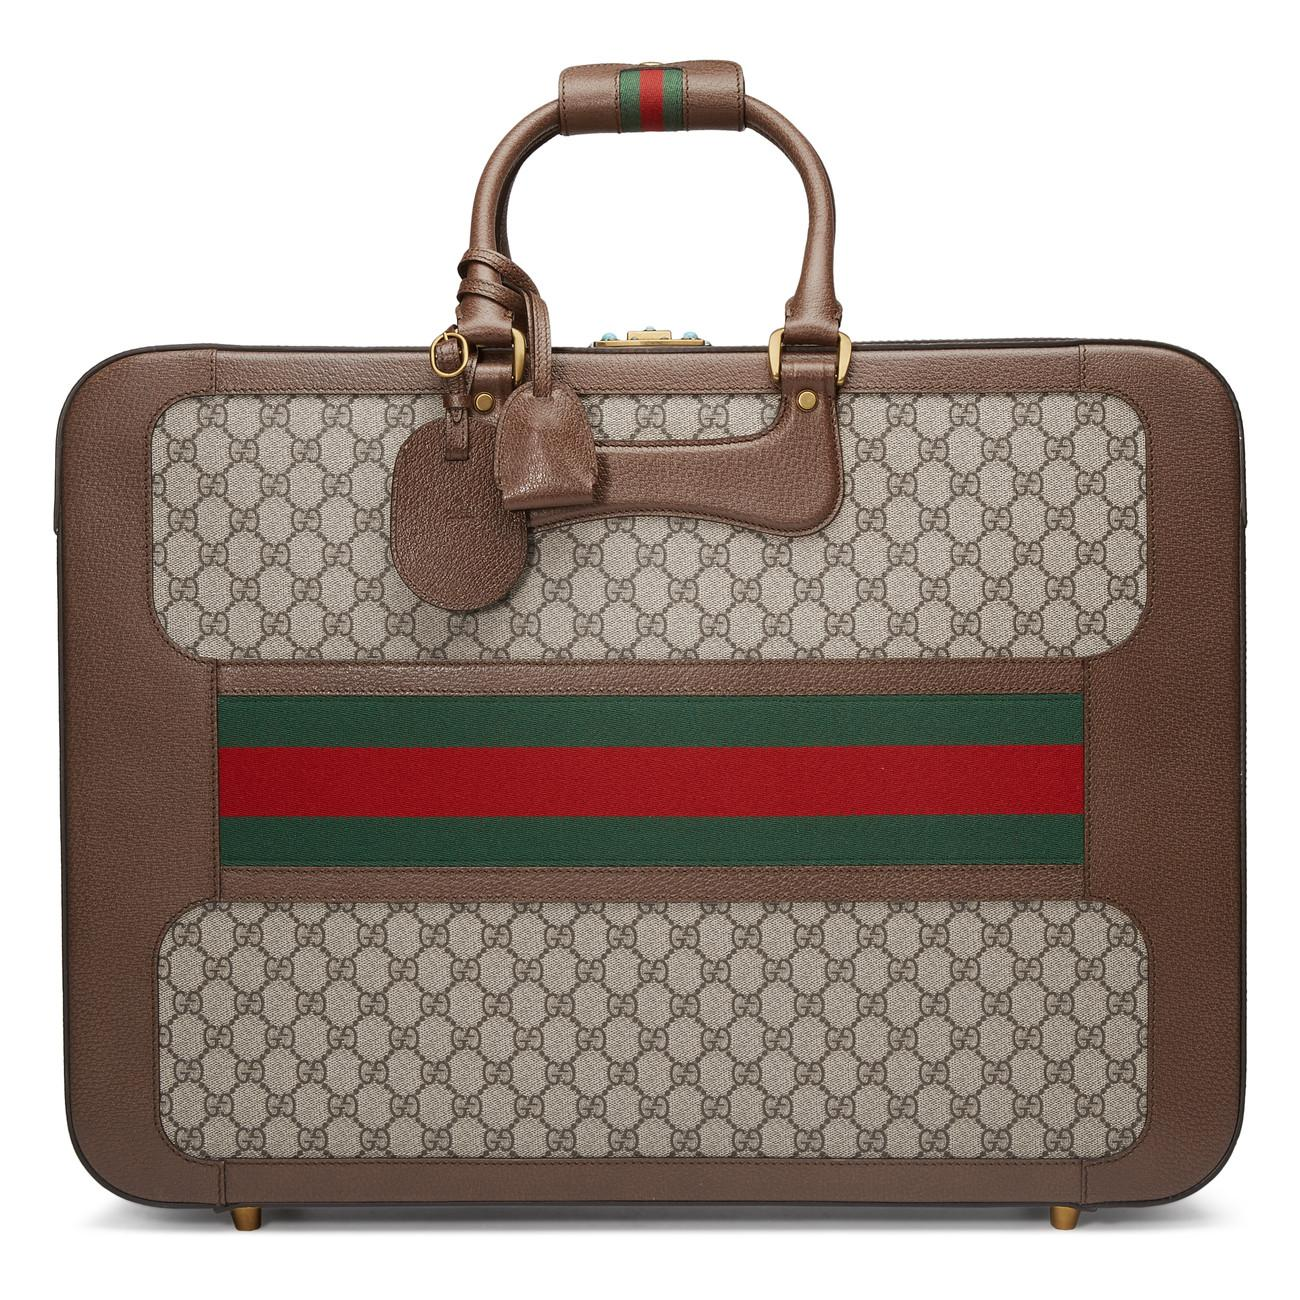 af54b93ef7ba Lyst - Gucci GG Supreme Suitcase With Web for Men